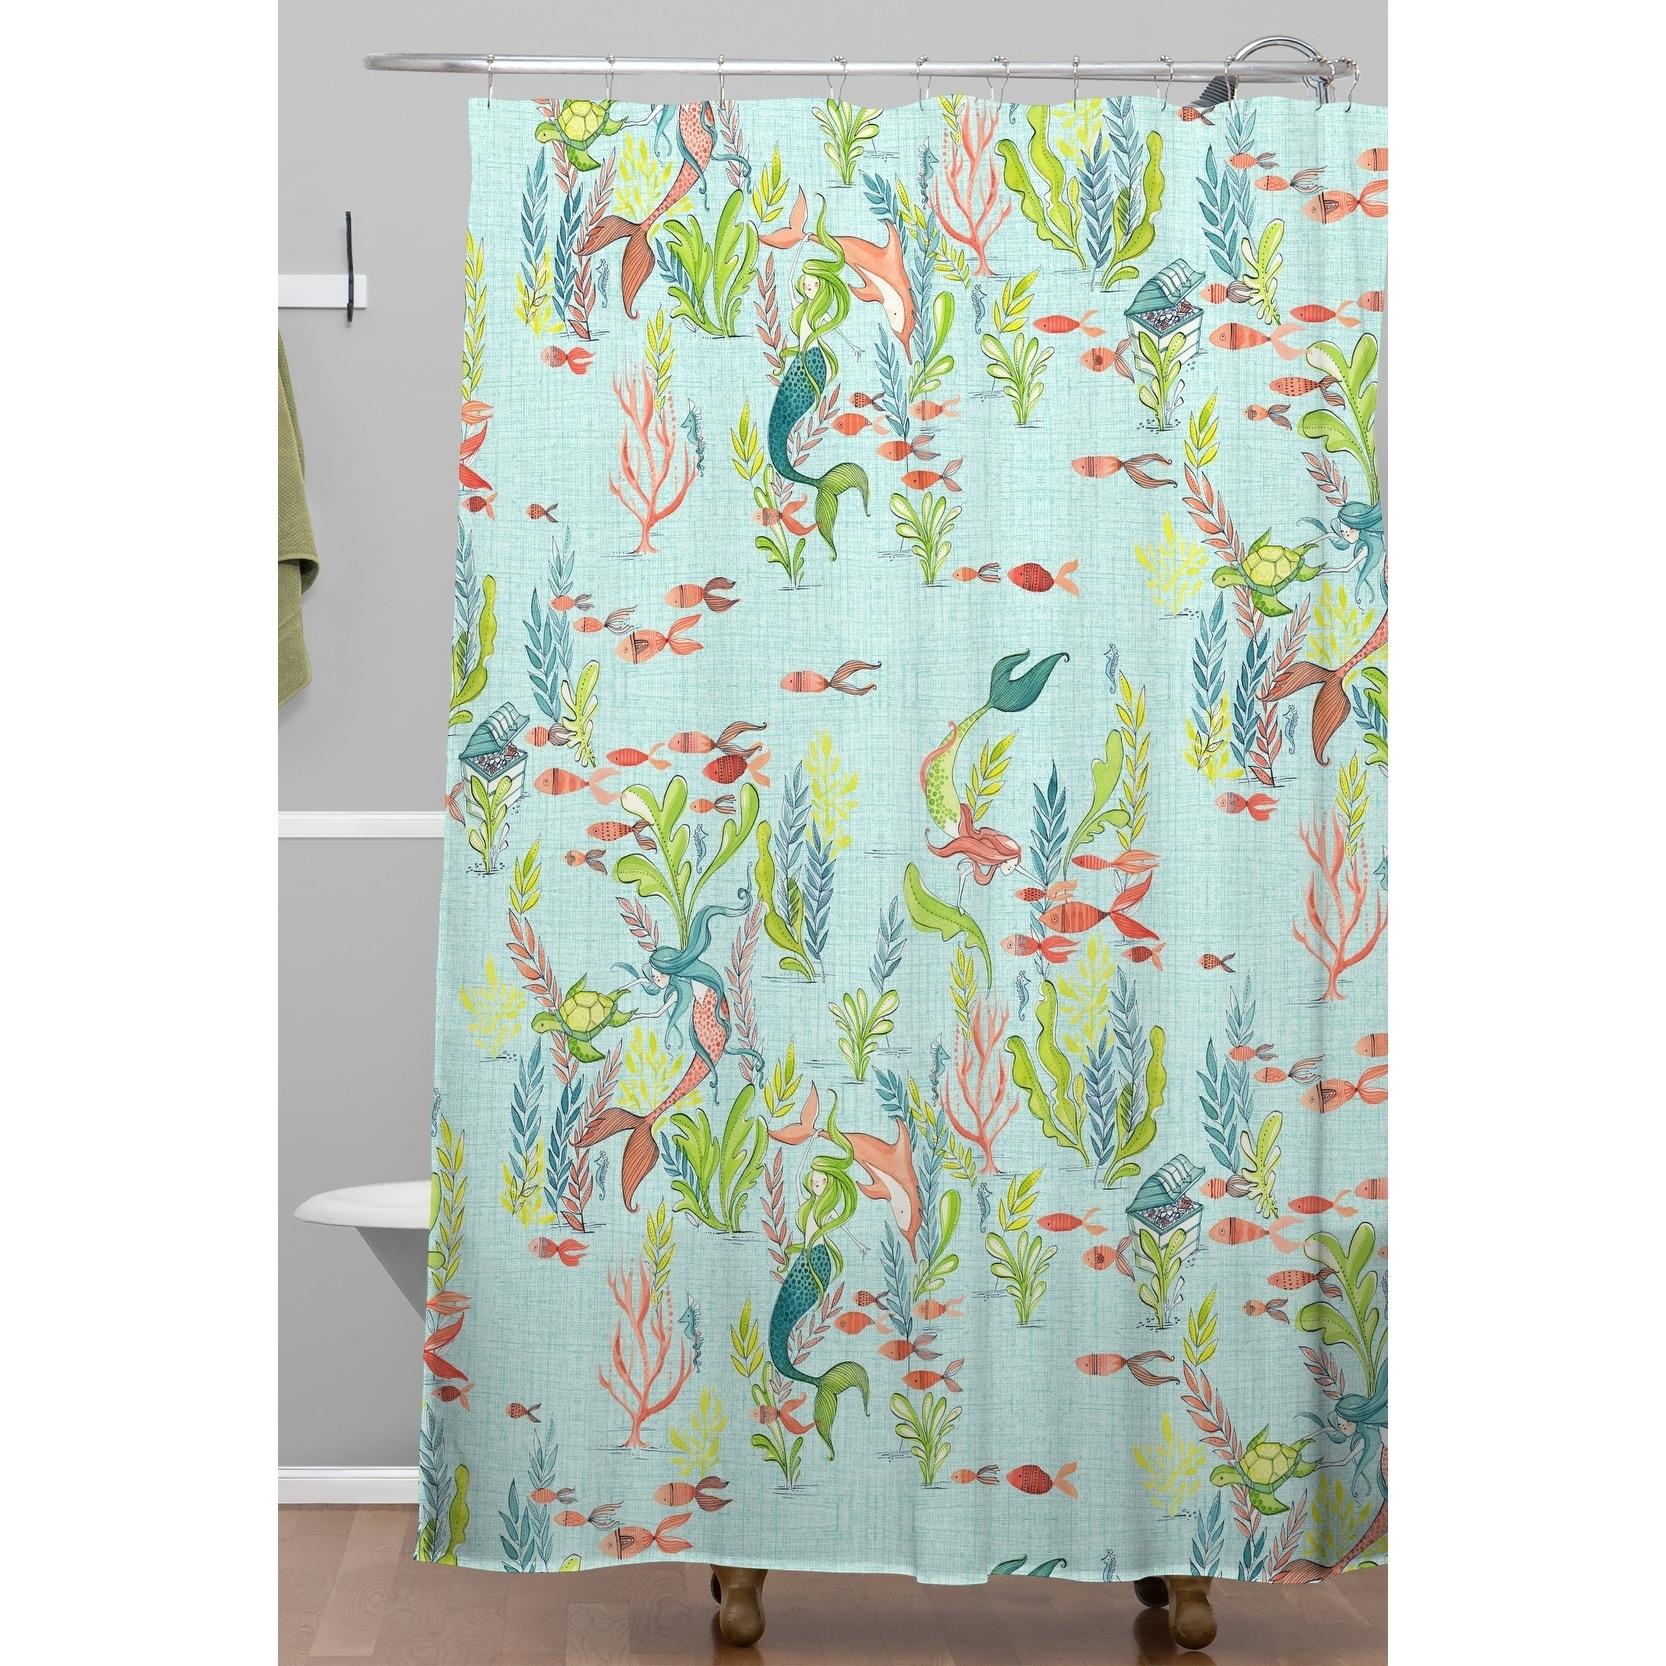 Cori Dantini The Mermaids Tale Shower Curtain On Free Shipping Today 21013667